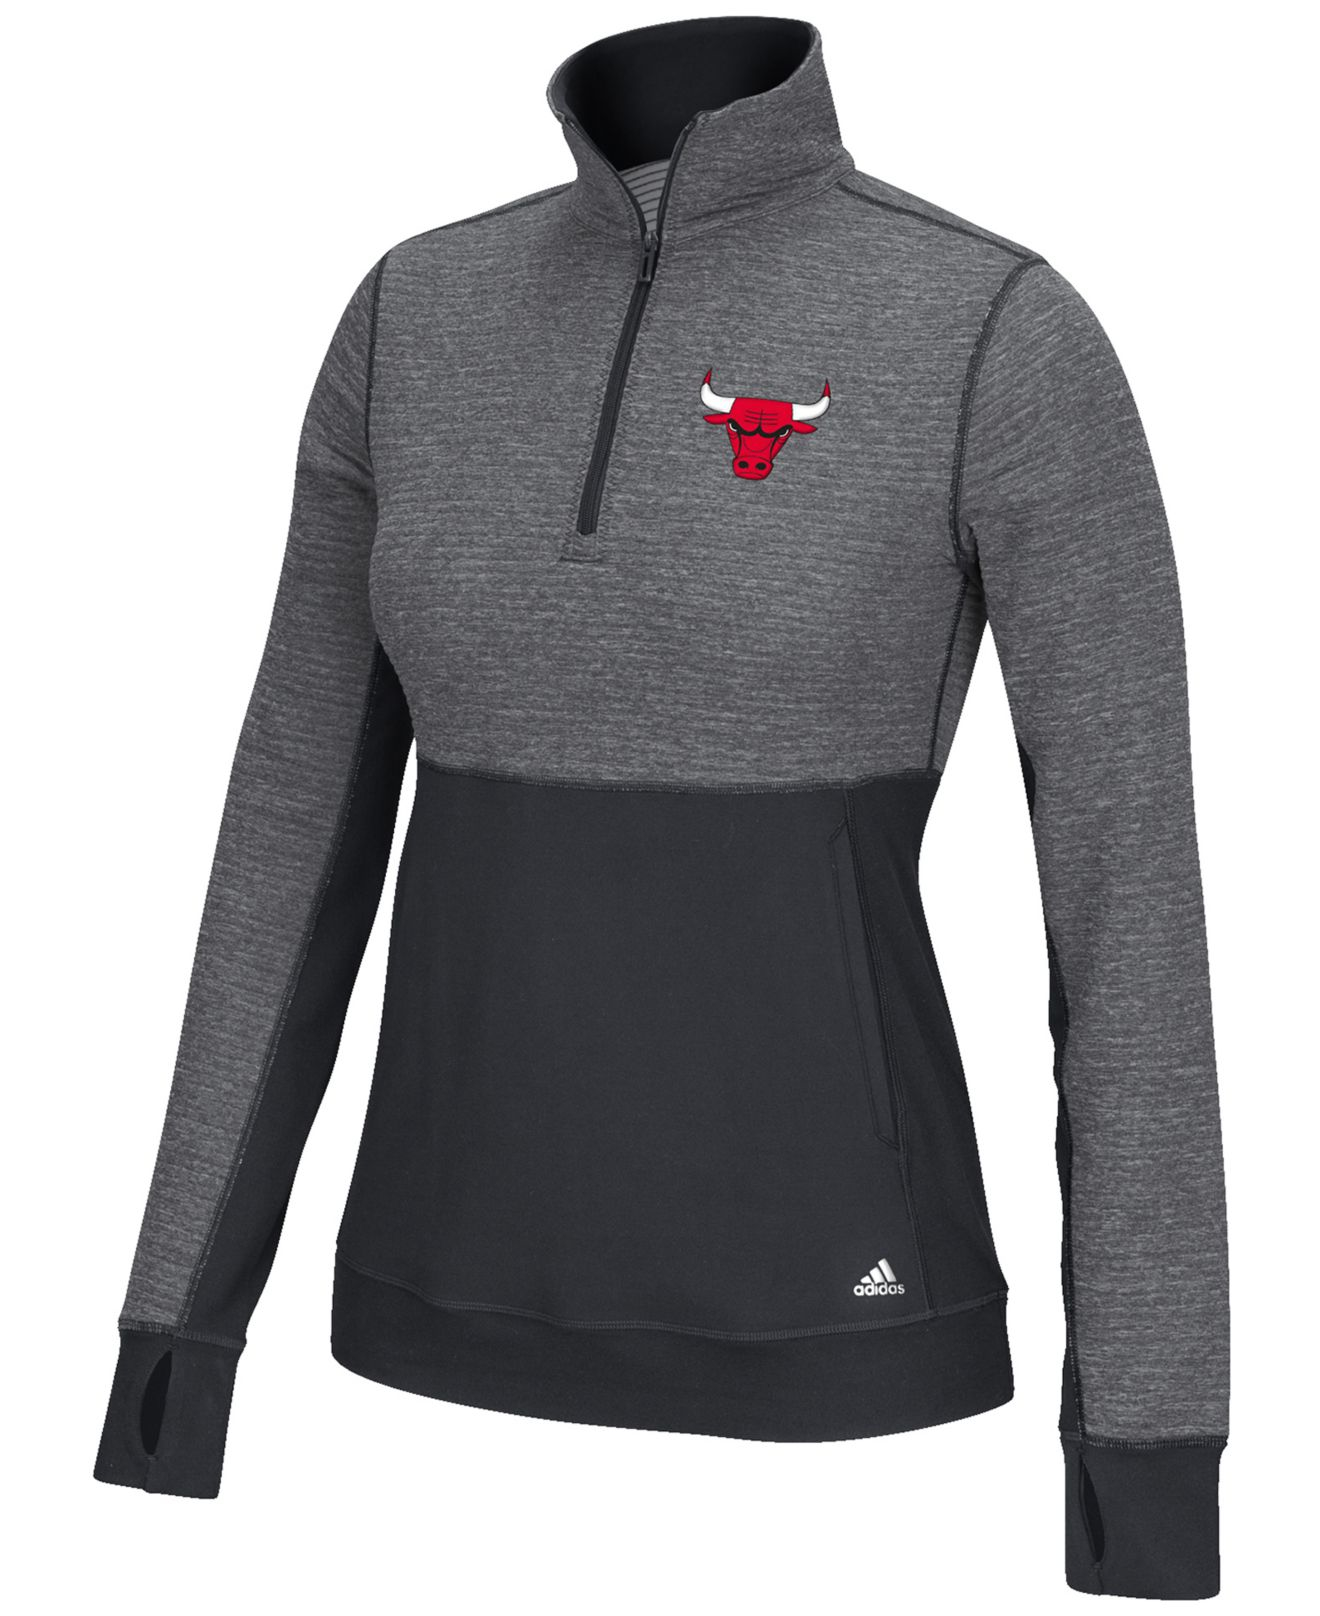 Lyst - Adidas Women s Chicago Bulls Climalite Quarter-zip Jacket in ... 0c6b7c071